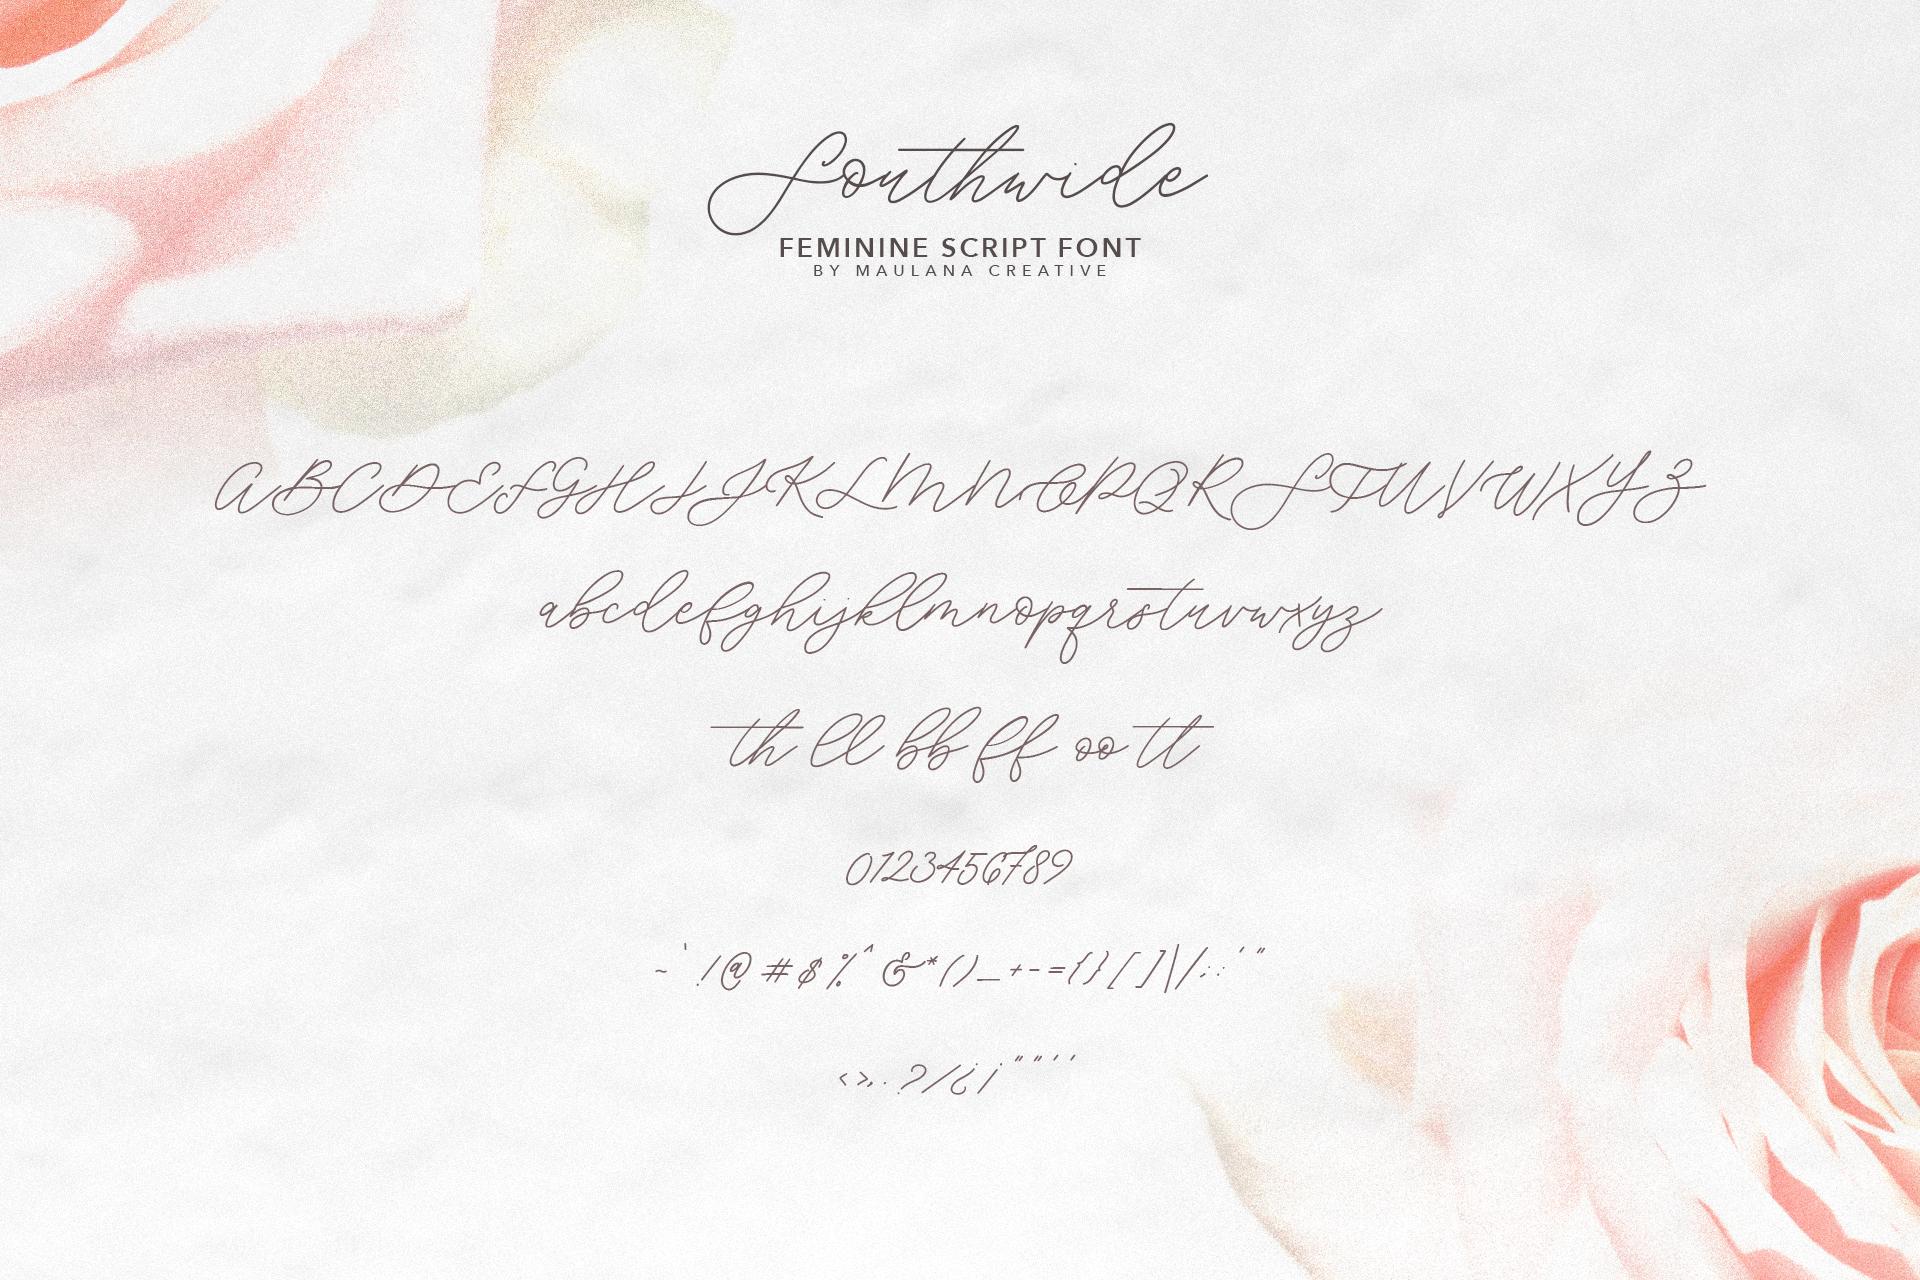 Southwide Feminine Script Font example image 10